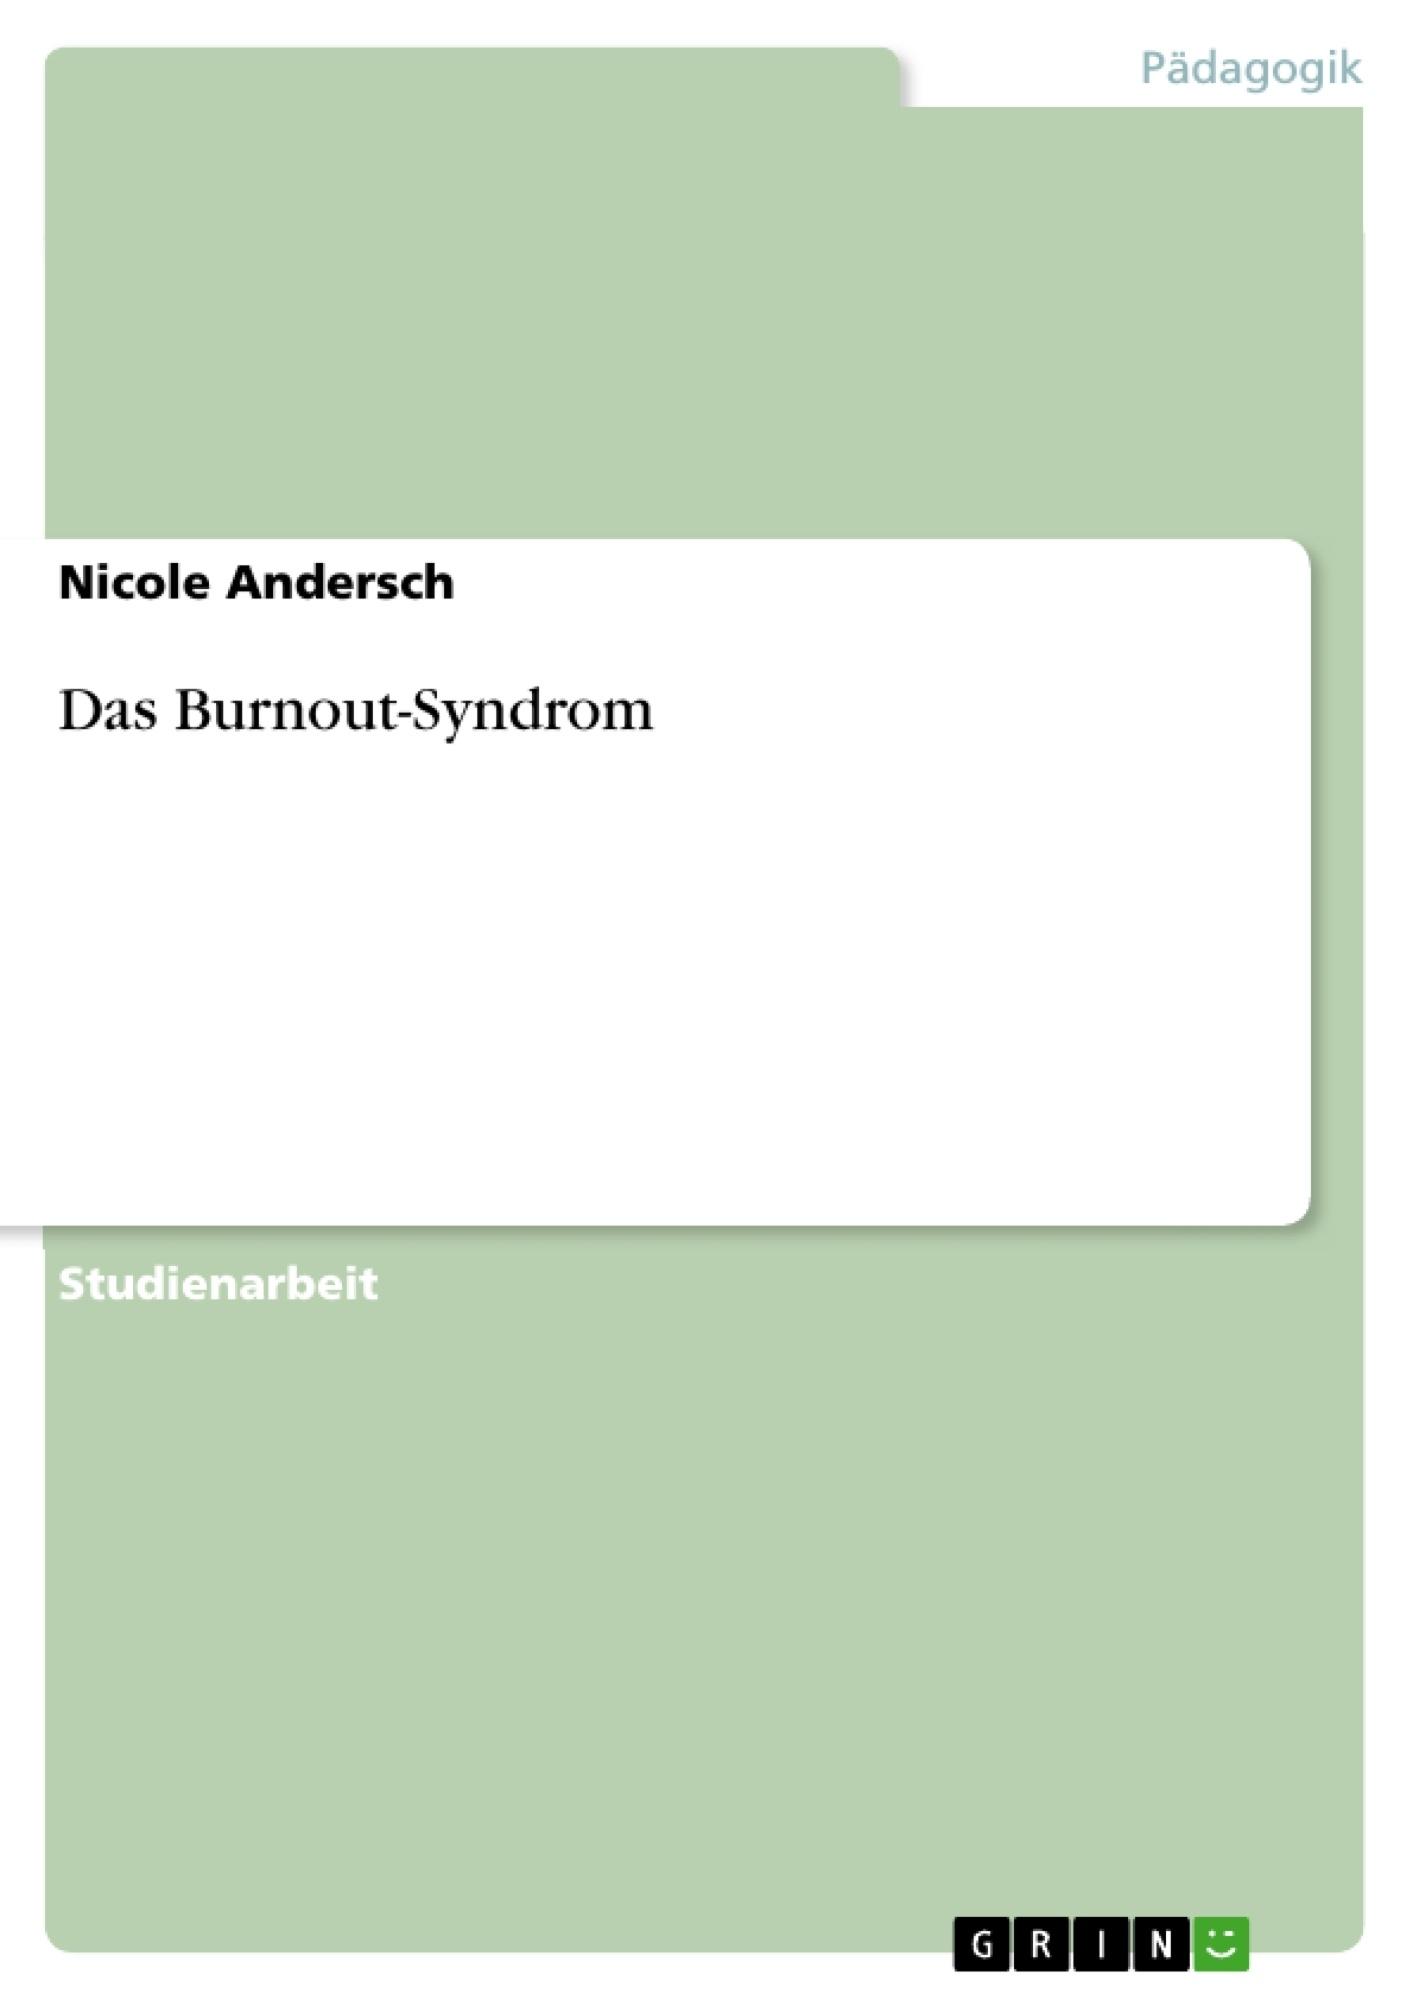 Titel: Das Burnout-Syndrom